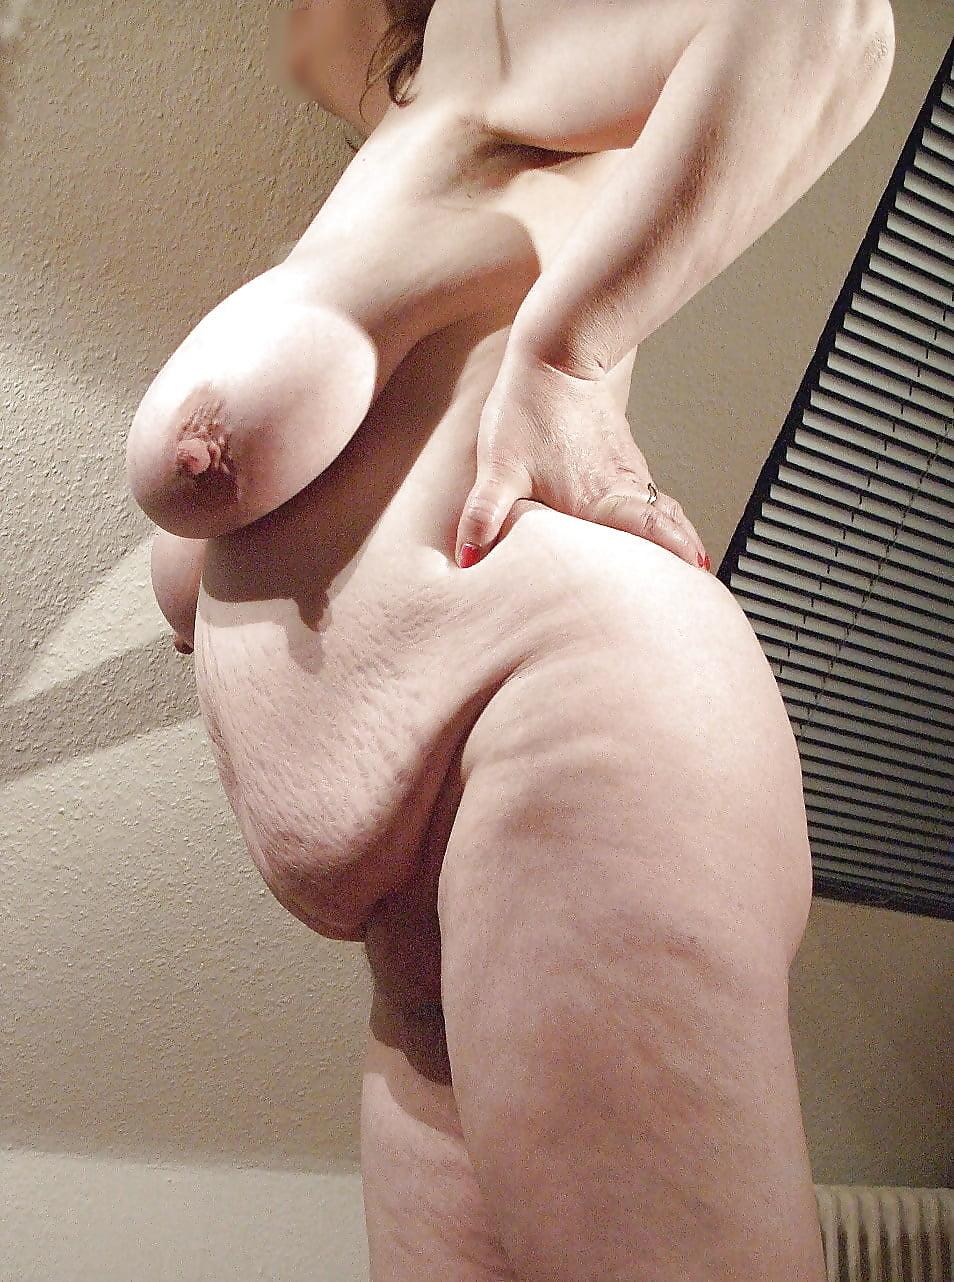 Stretch mark tits nude — photo 14